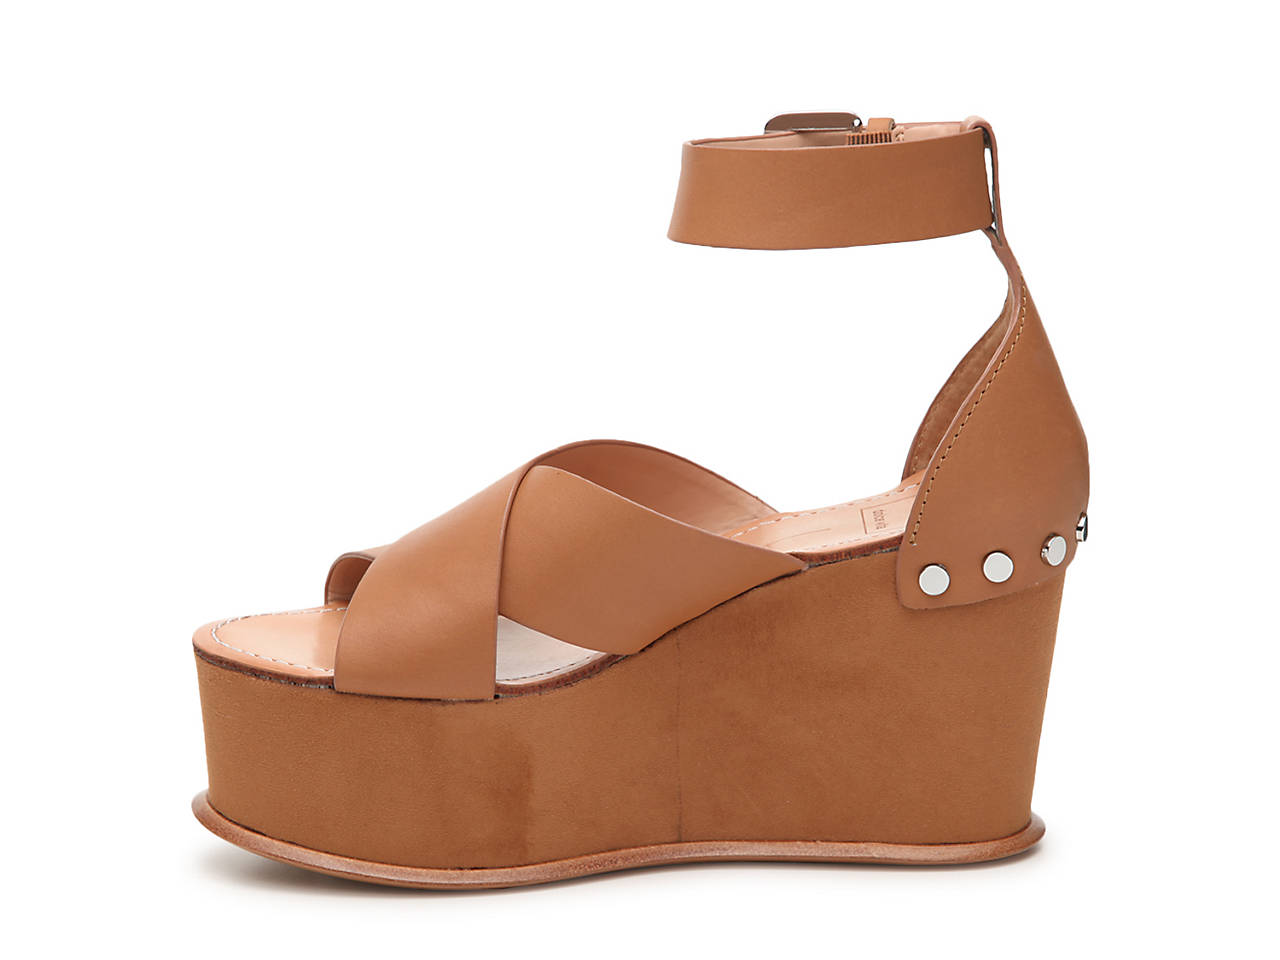 29cef0354c6 Dolce Vita Dalrae Wedge Sandal Women s Shoes